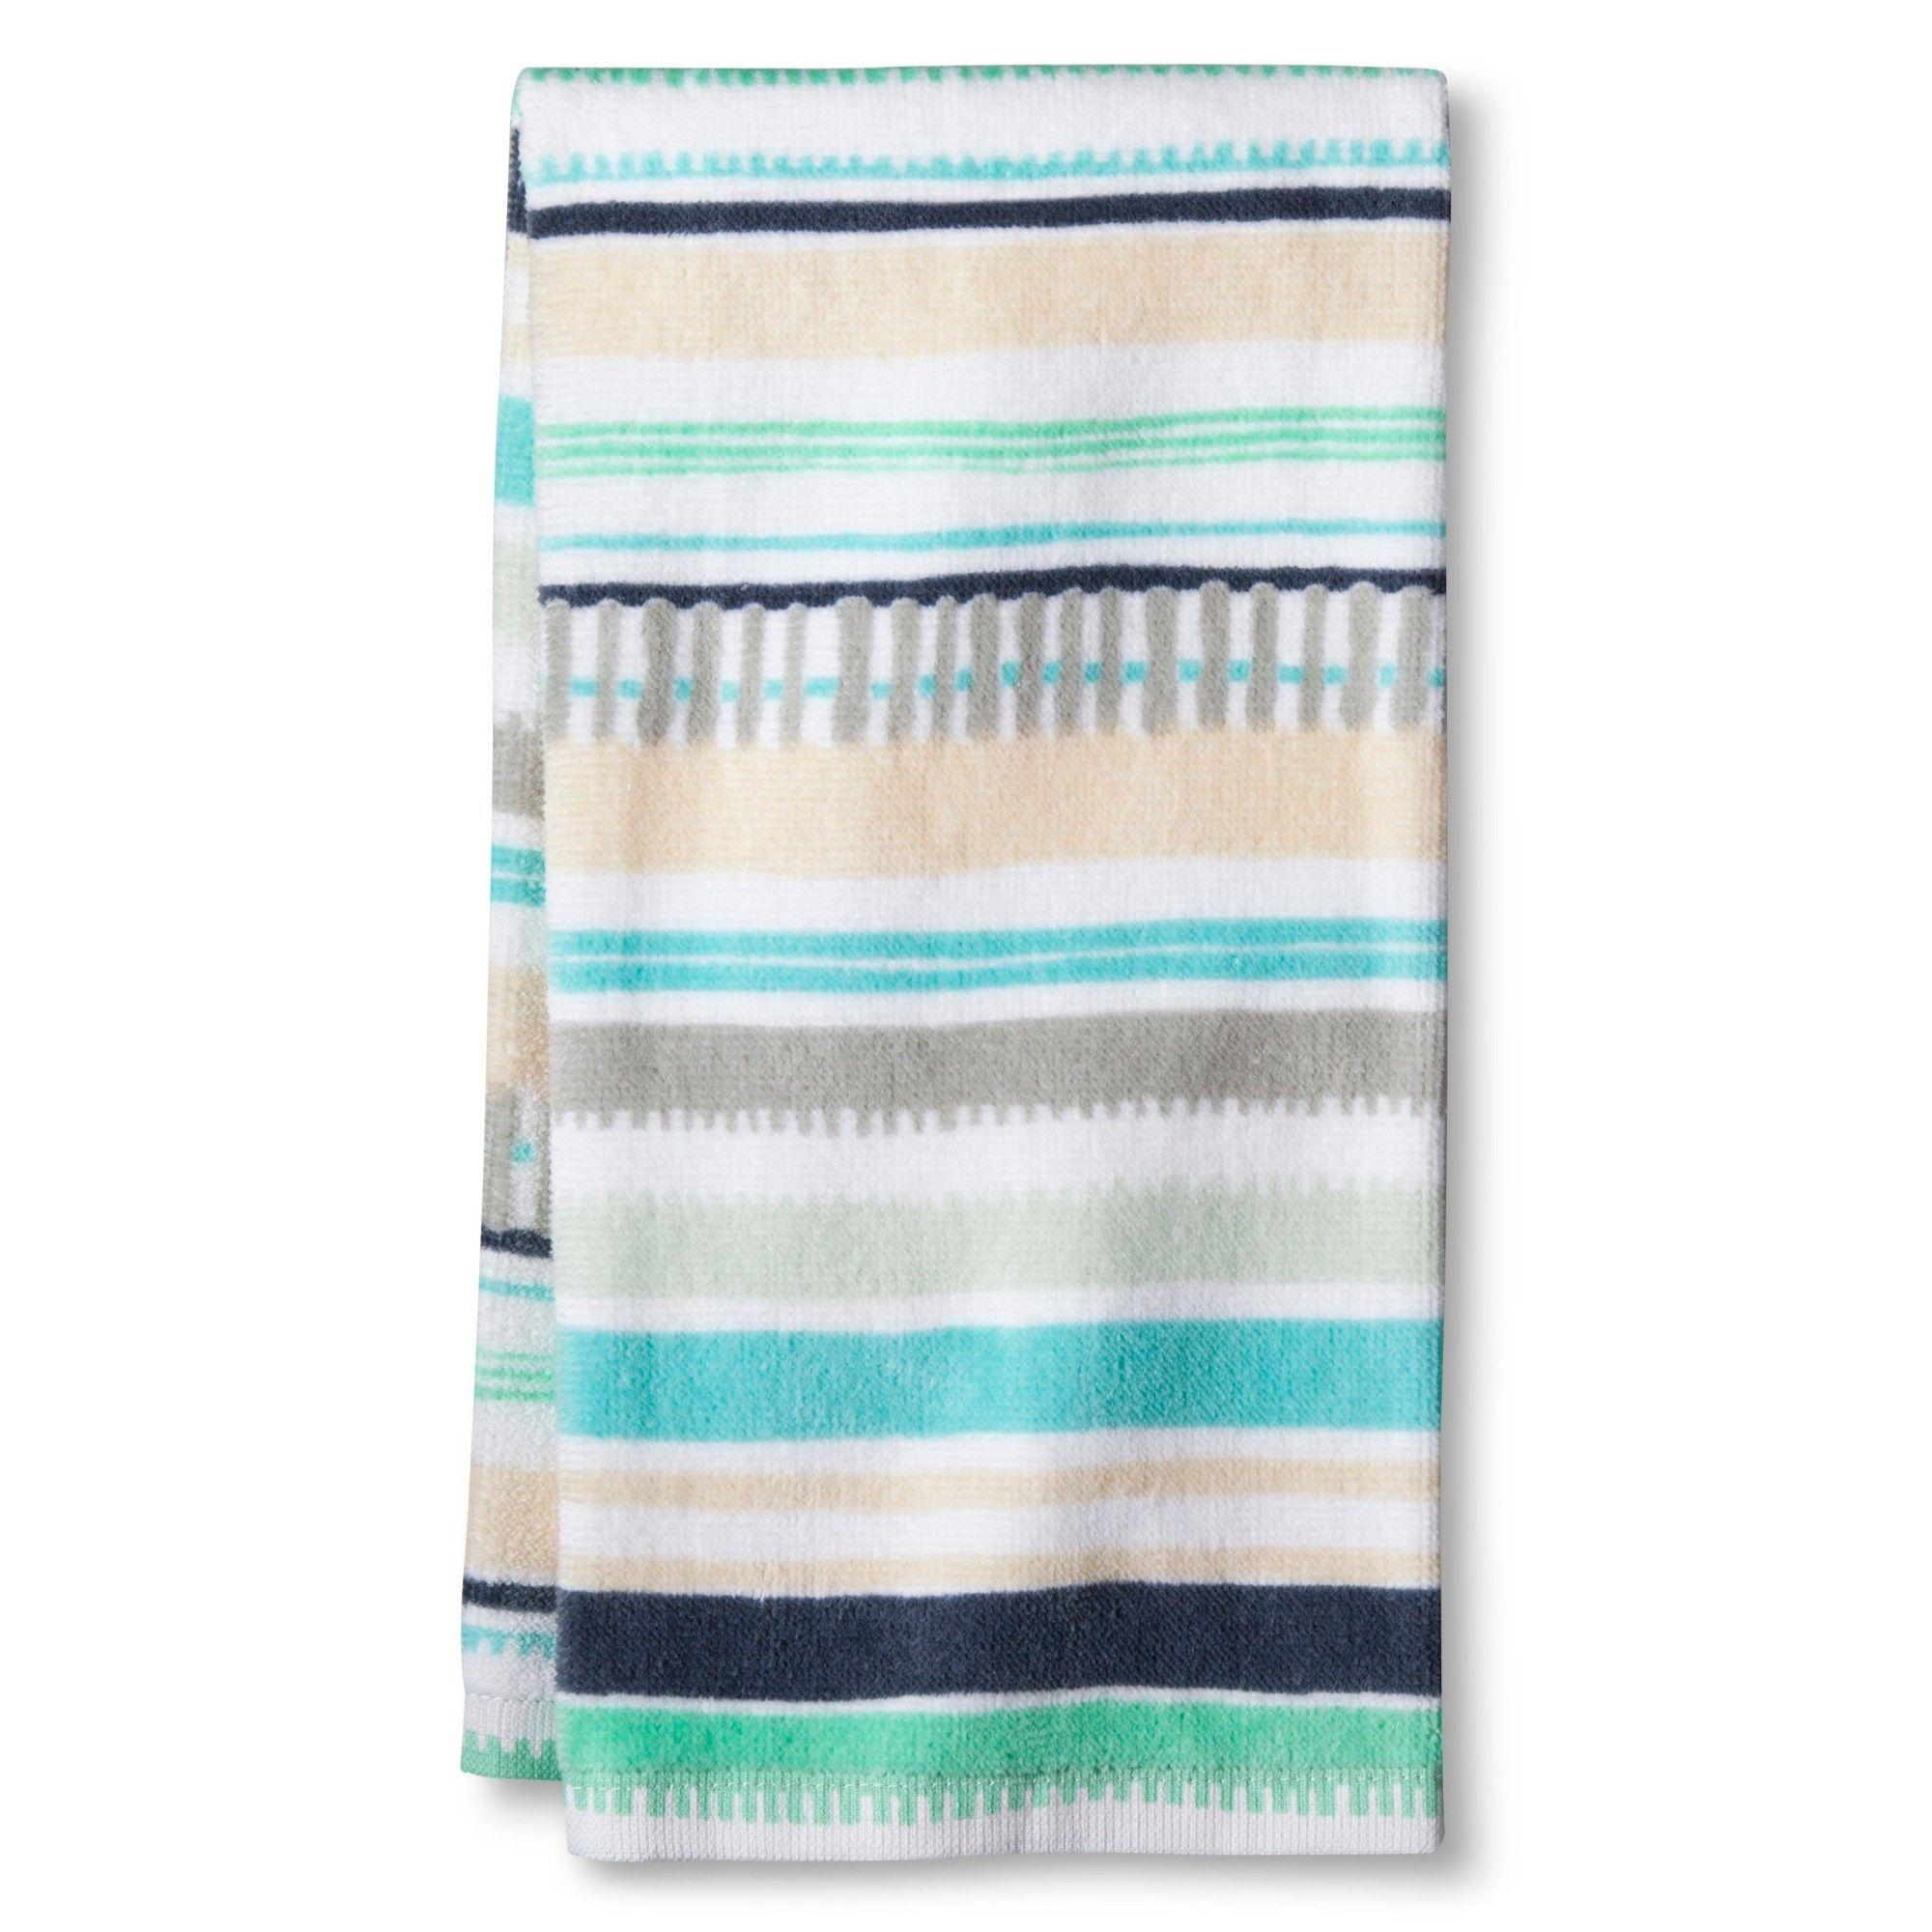 Blue Nbspmulti Stripe Nbspkitchen Towel Room Essentials Blue